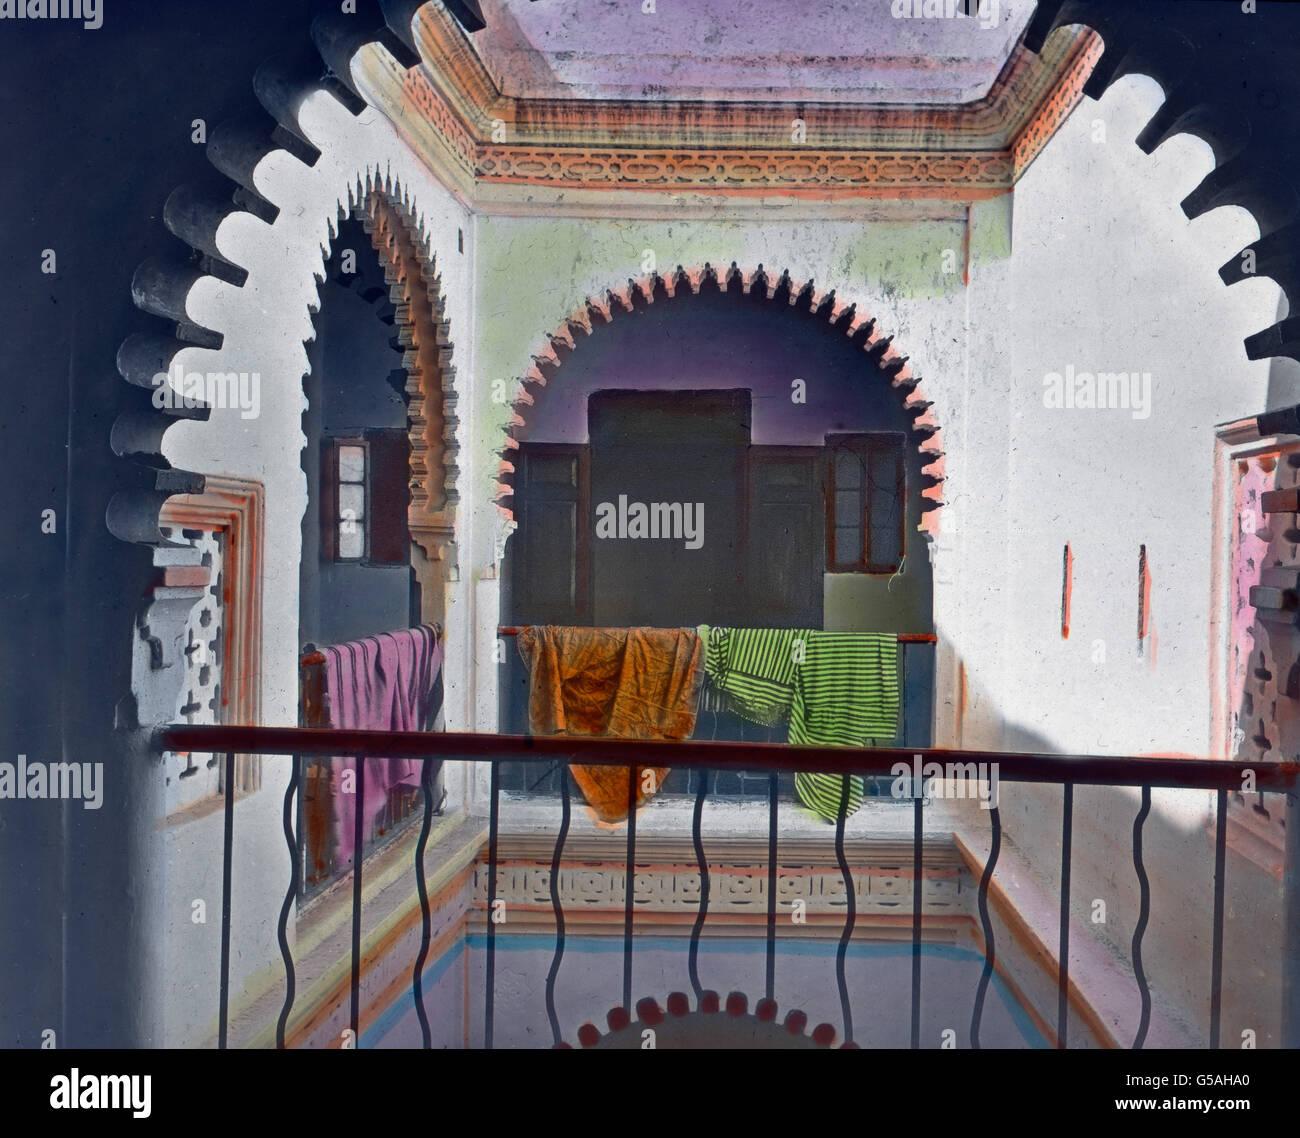 Arkadenbögen Im Inneren Eines Begüterten Malgrat. Marokko, Marokko ...